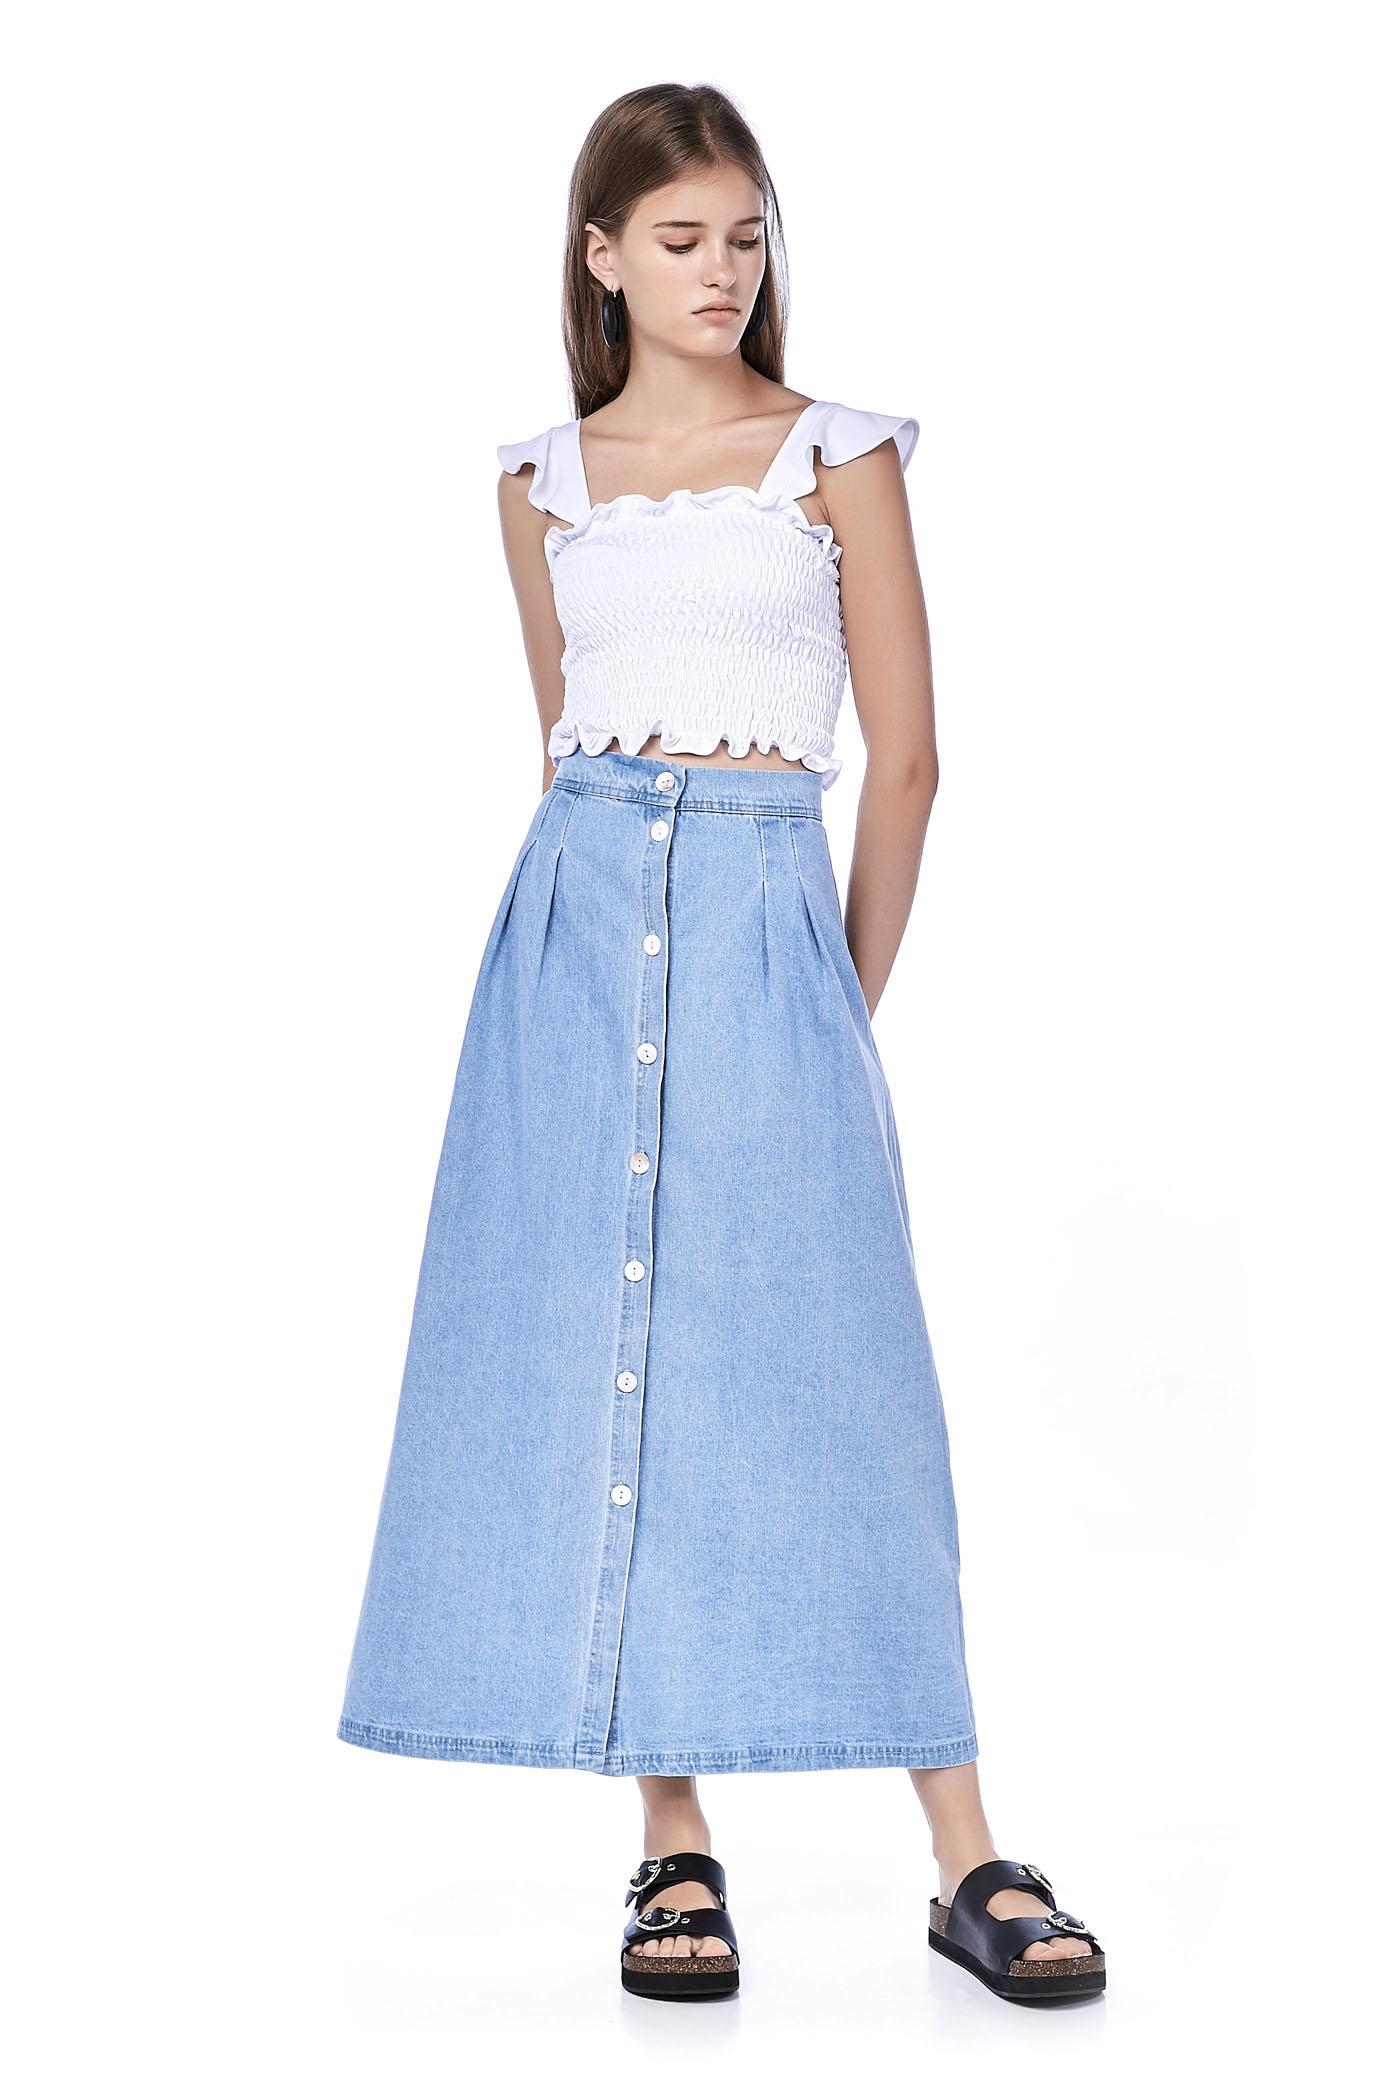 Lyre Button-Through Denim Skirt